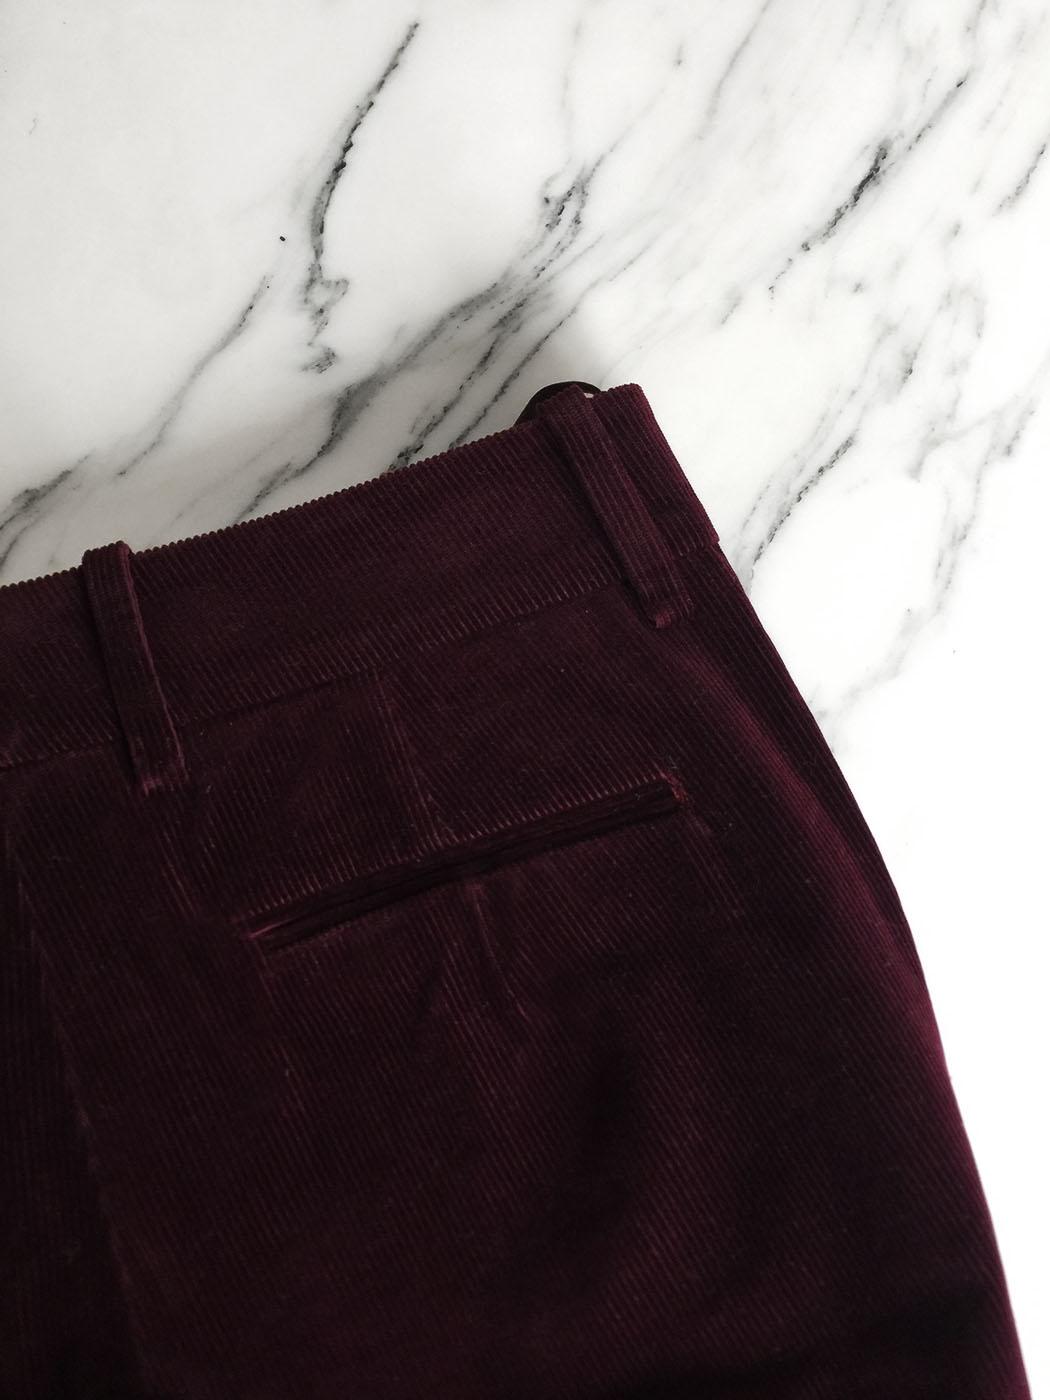 6c6564c0c5 ... HUGO BOSS Dark burgundy prune corduroy flared pants Retail price €300  Size 36 ...